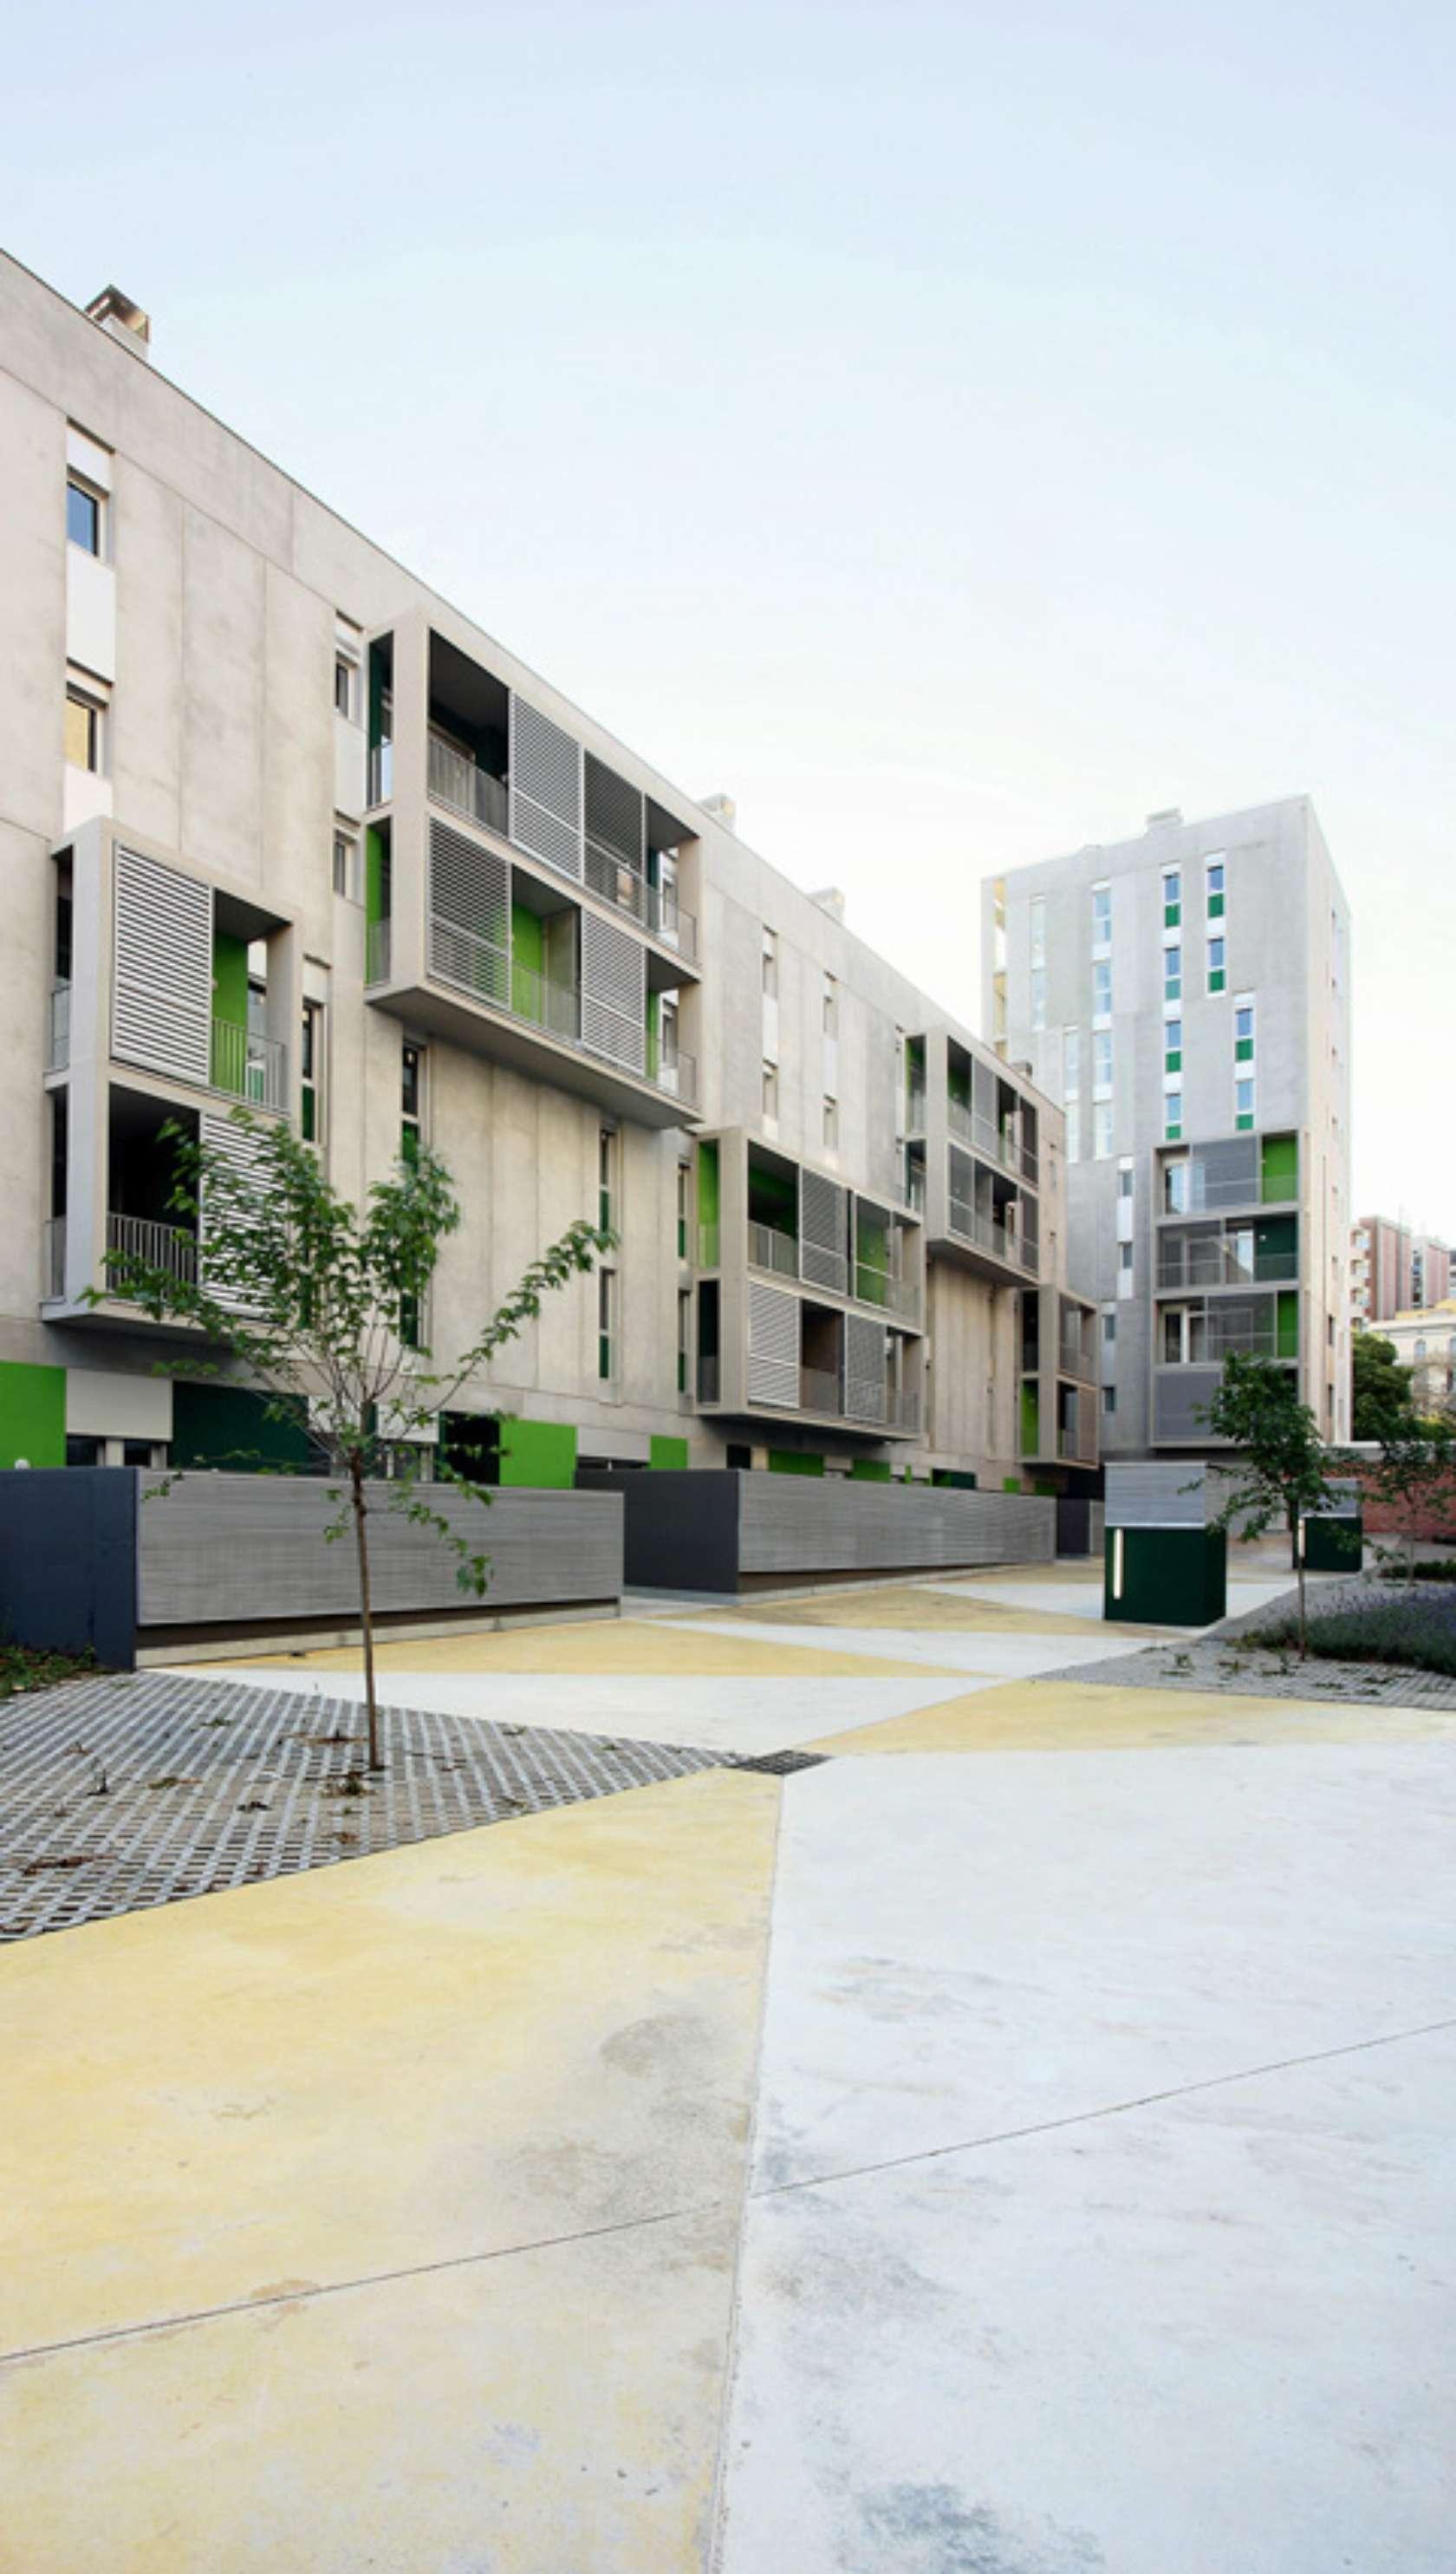 58 social housing les corts architizer - Flexo arquitectura ...